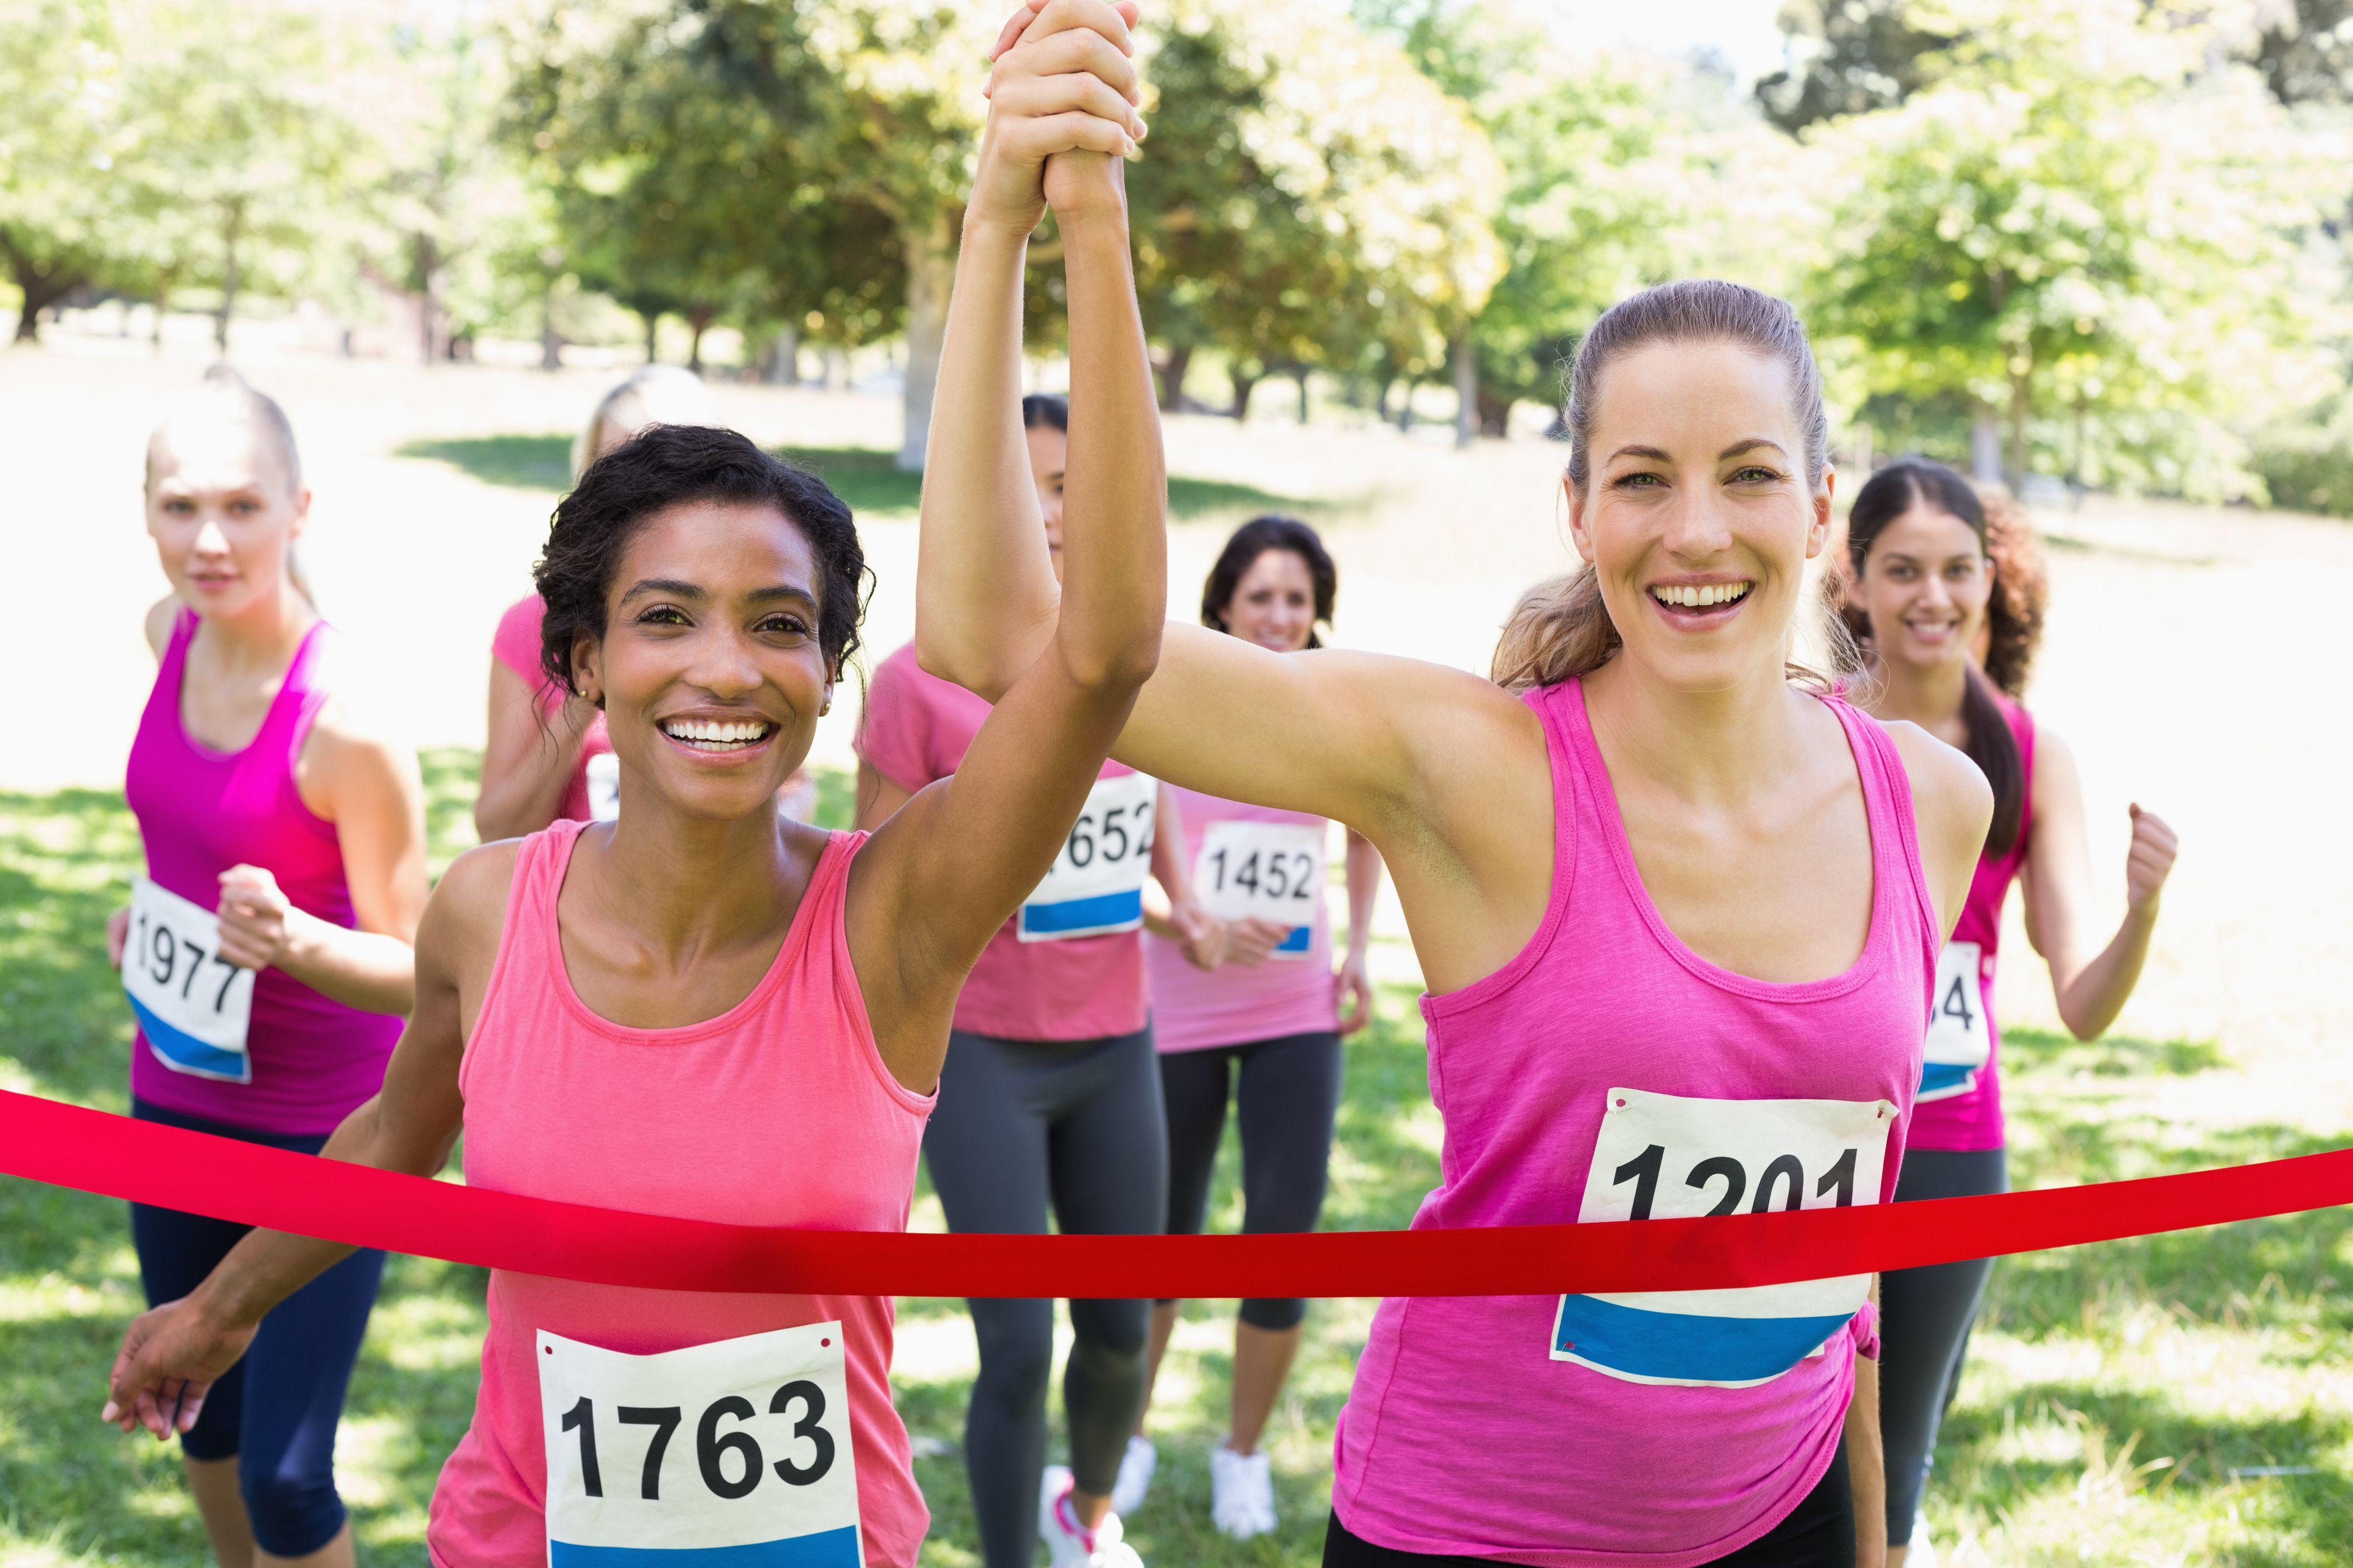 Breast cancer marathon reports